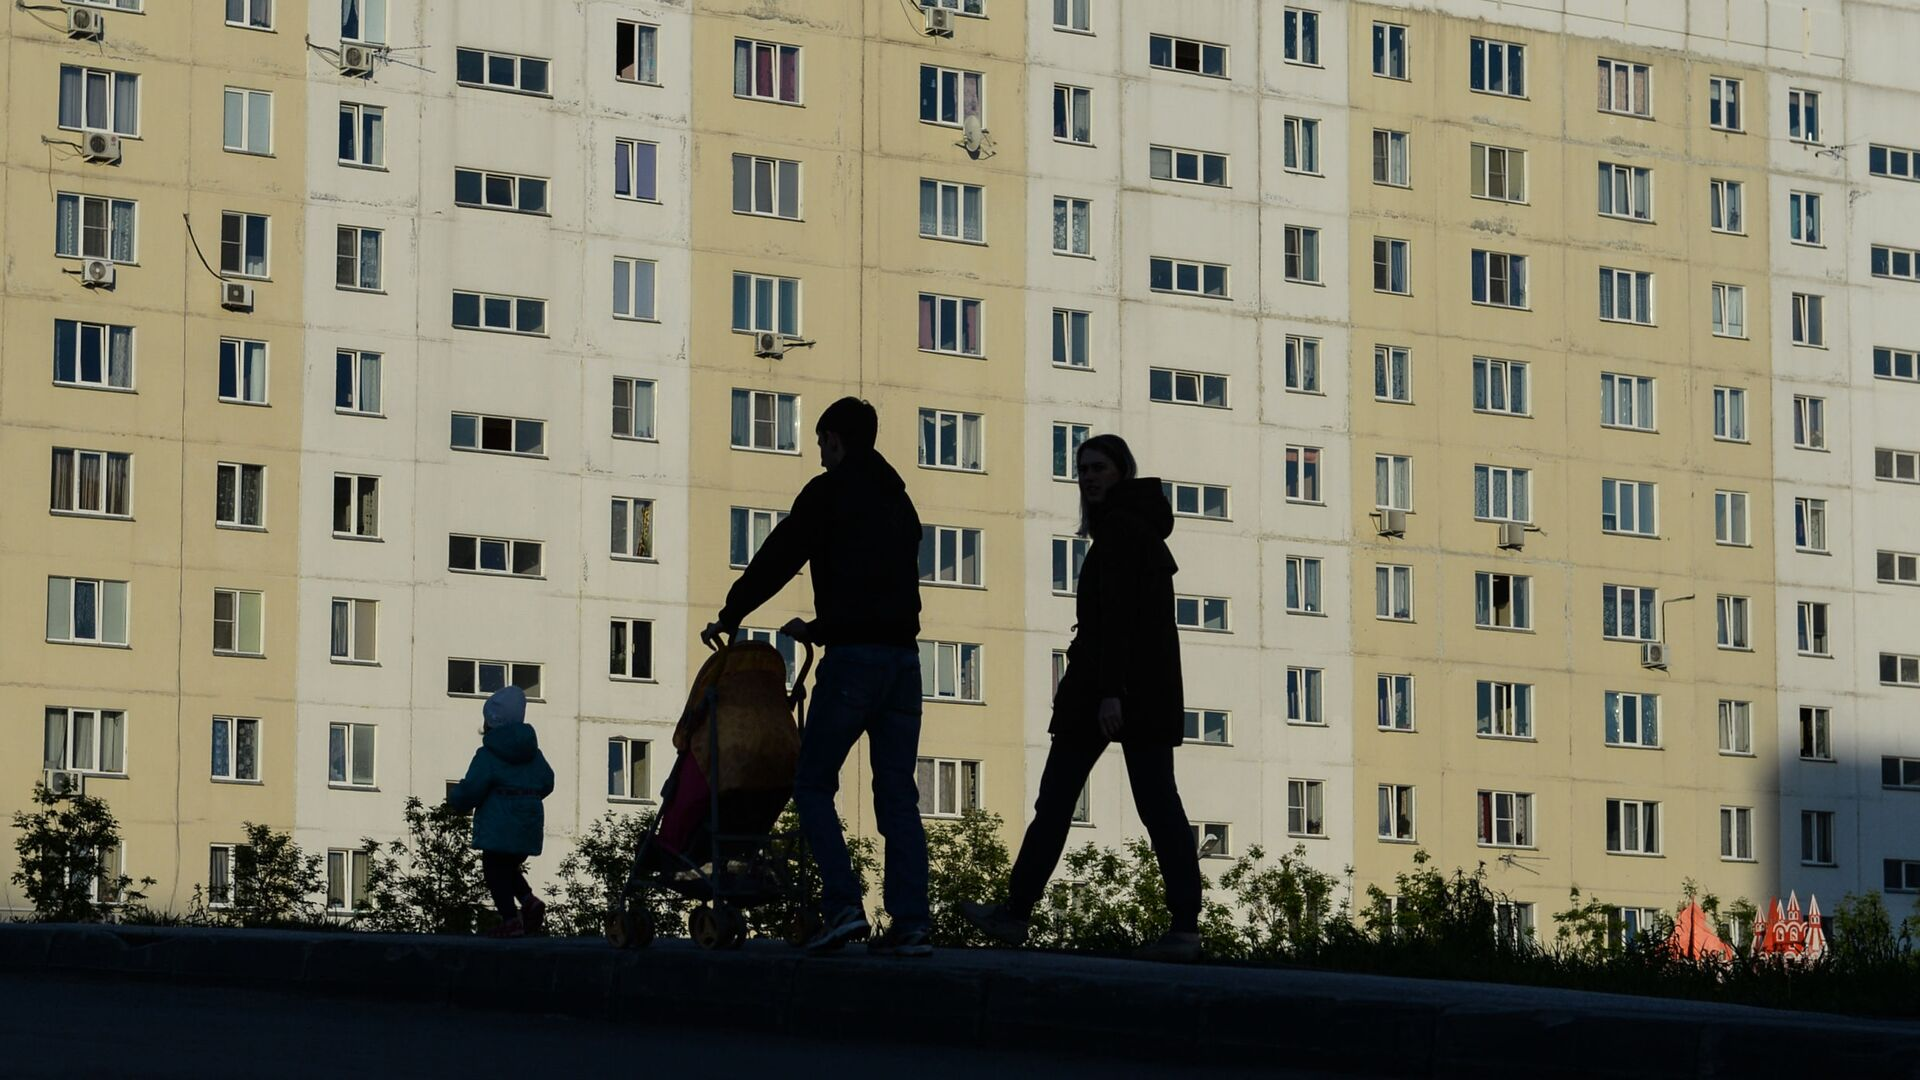 Семья во дворе жилого дома - РИА Новости, 1920, 13.10.2020